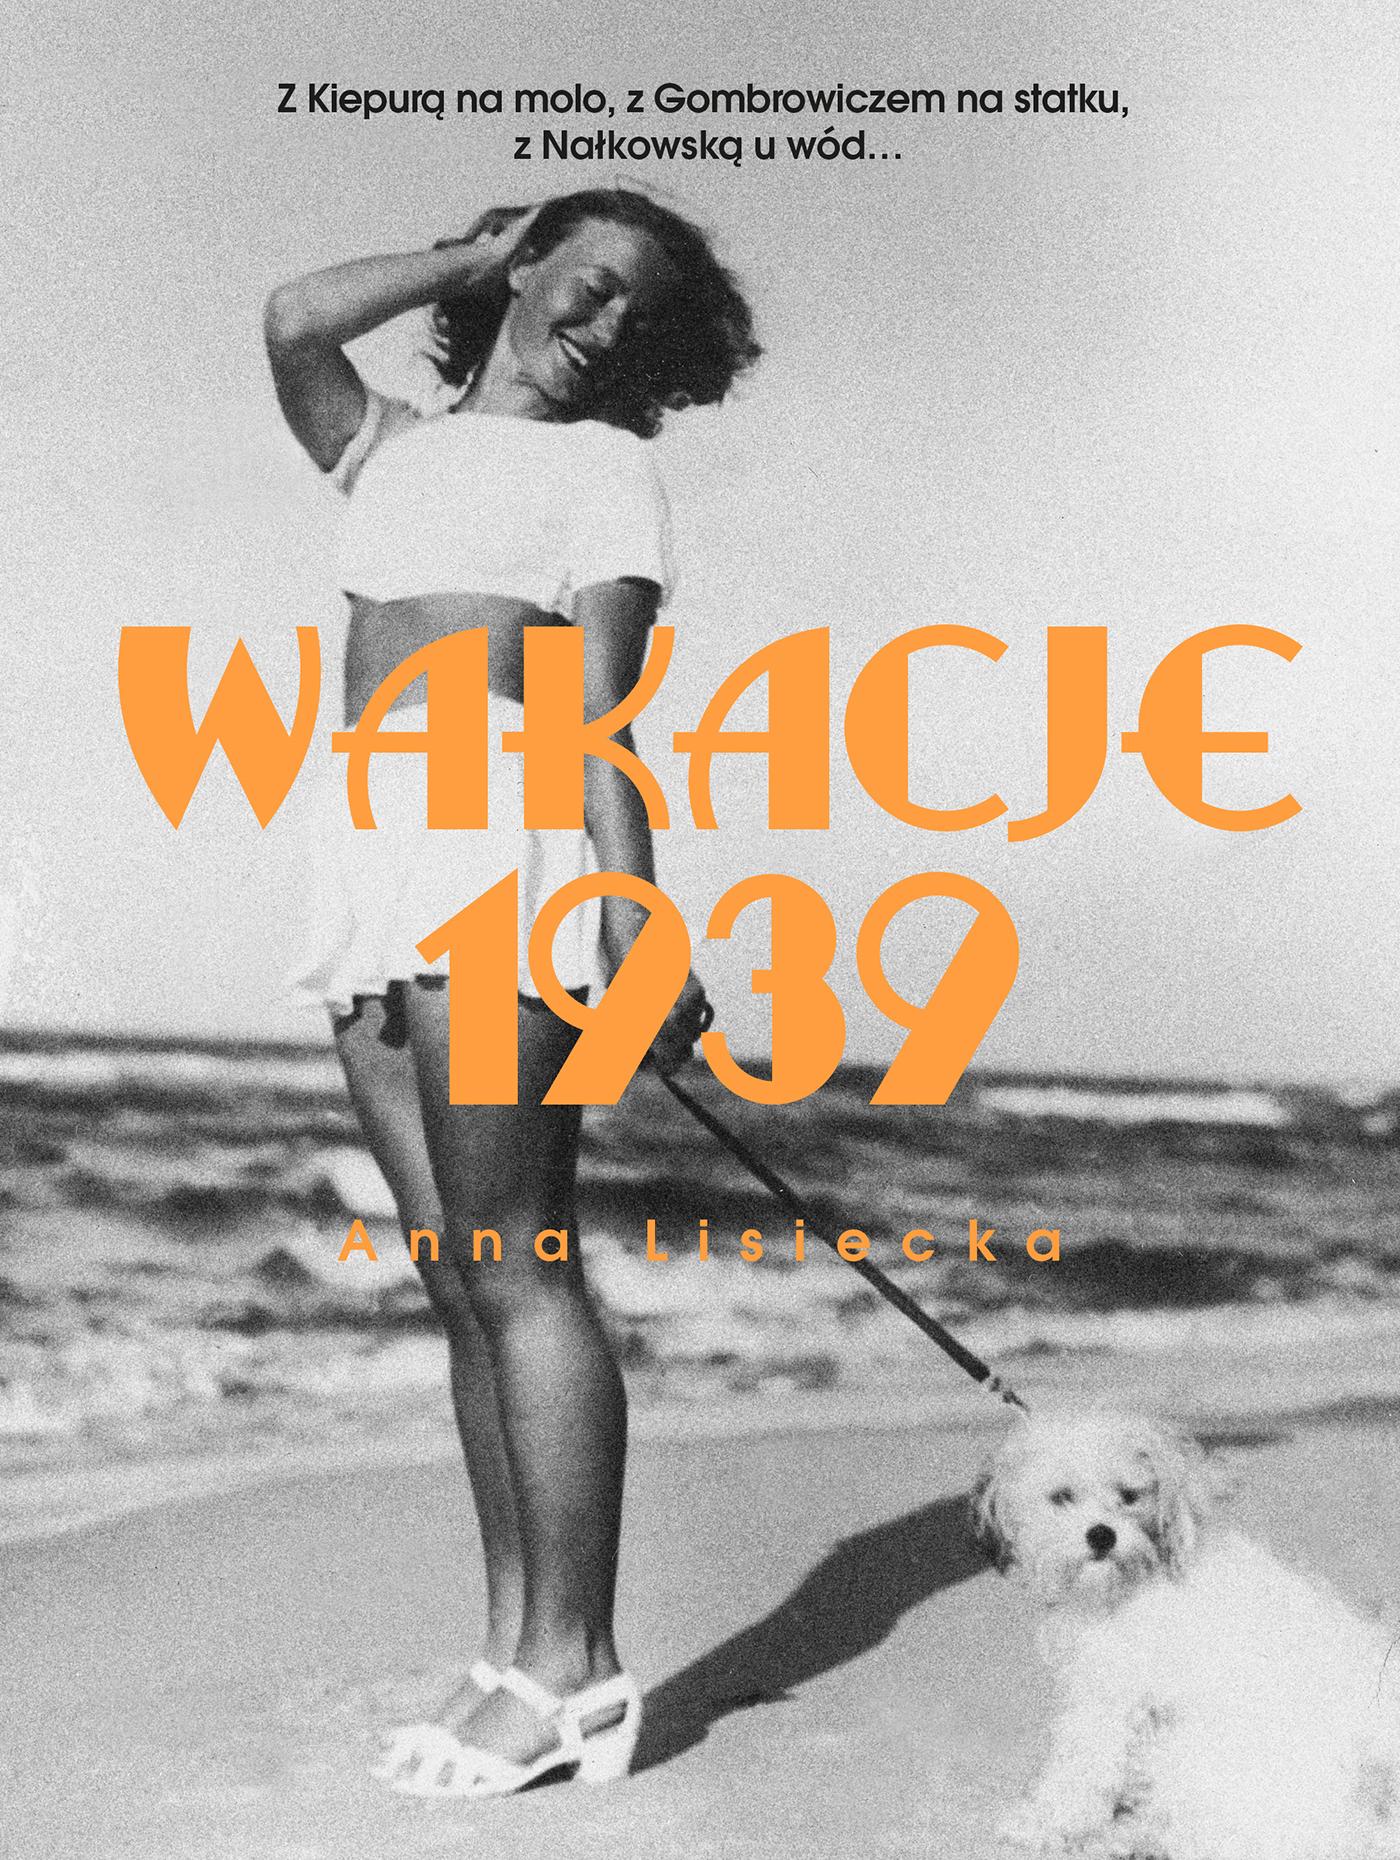 WAKACJE 1939, Pachniewska Dorota